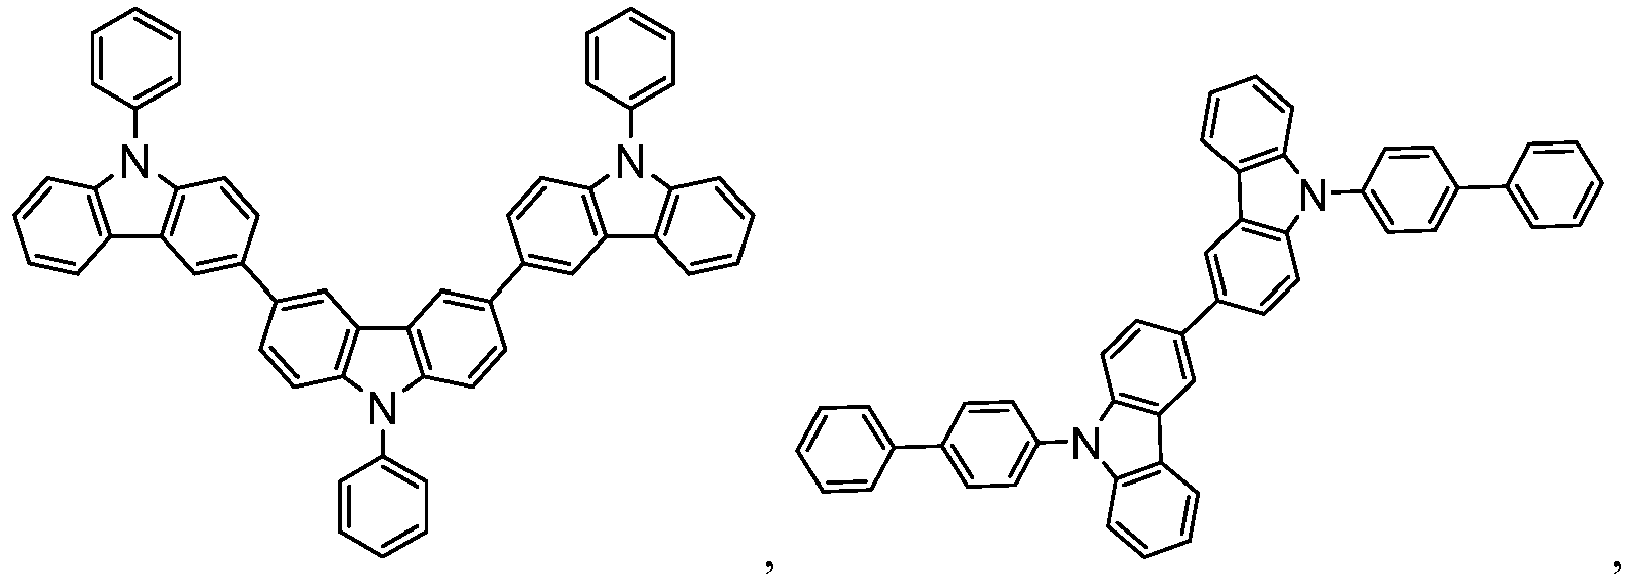 Figure imgb0897